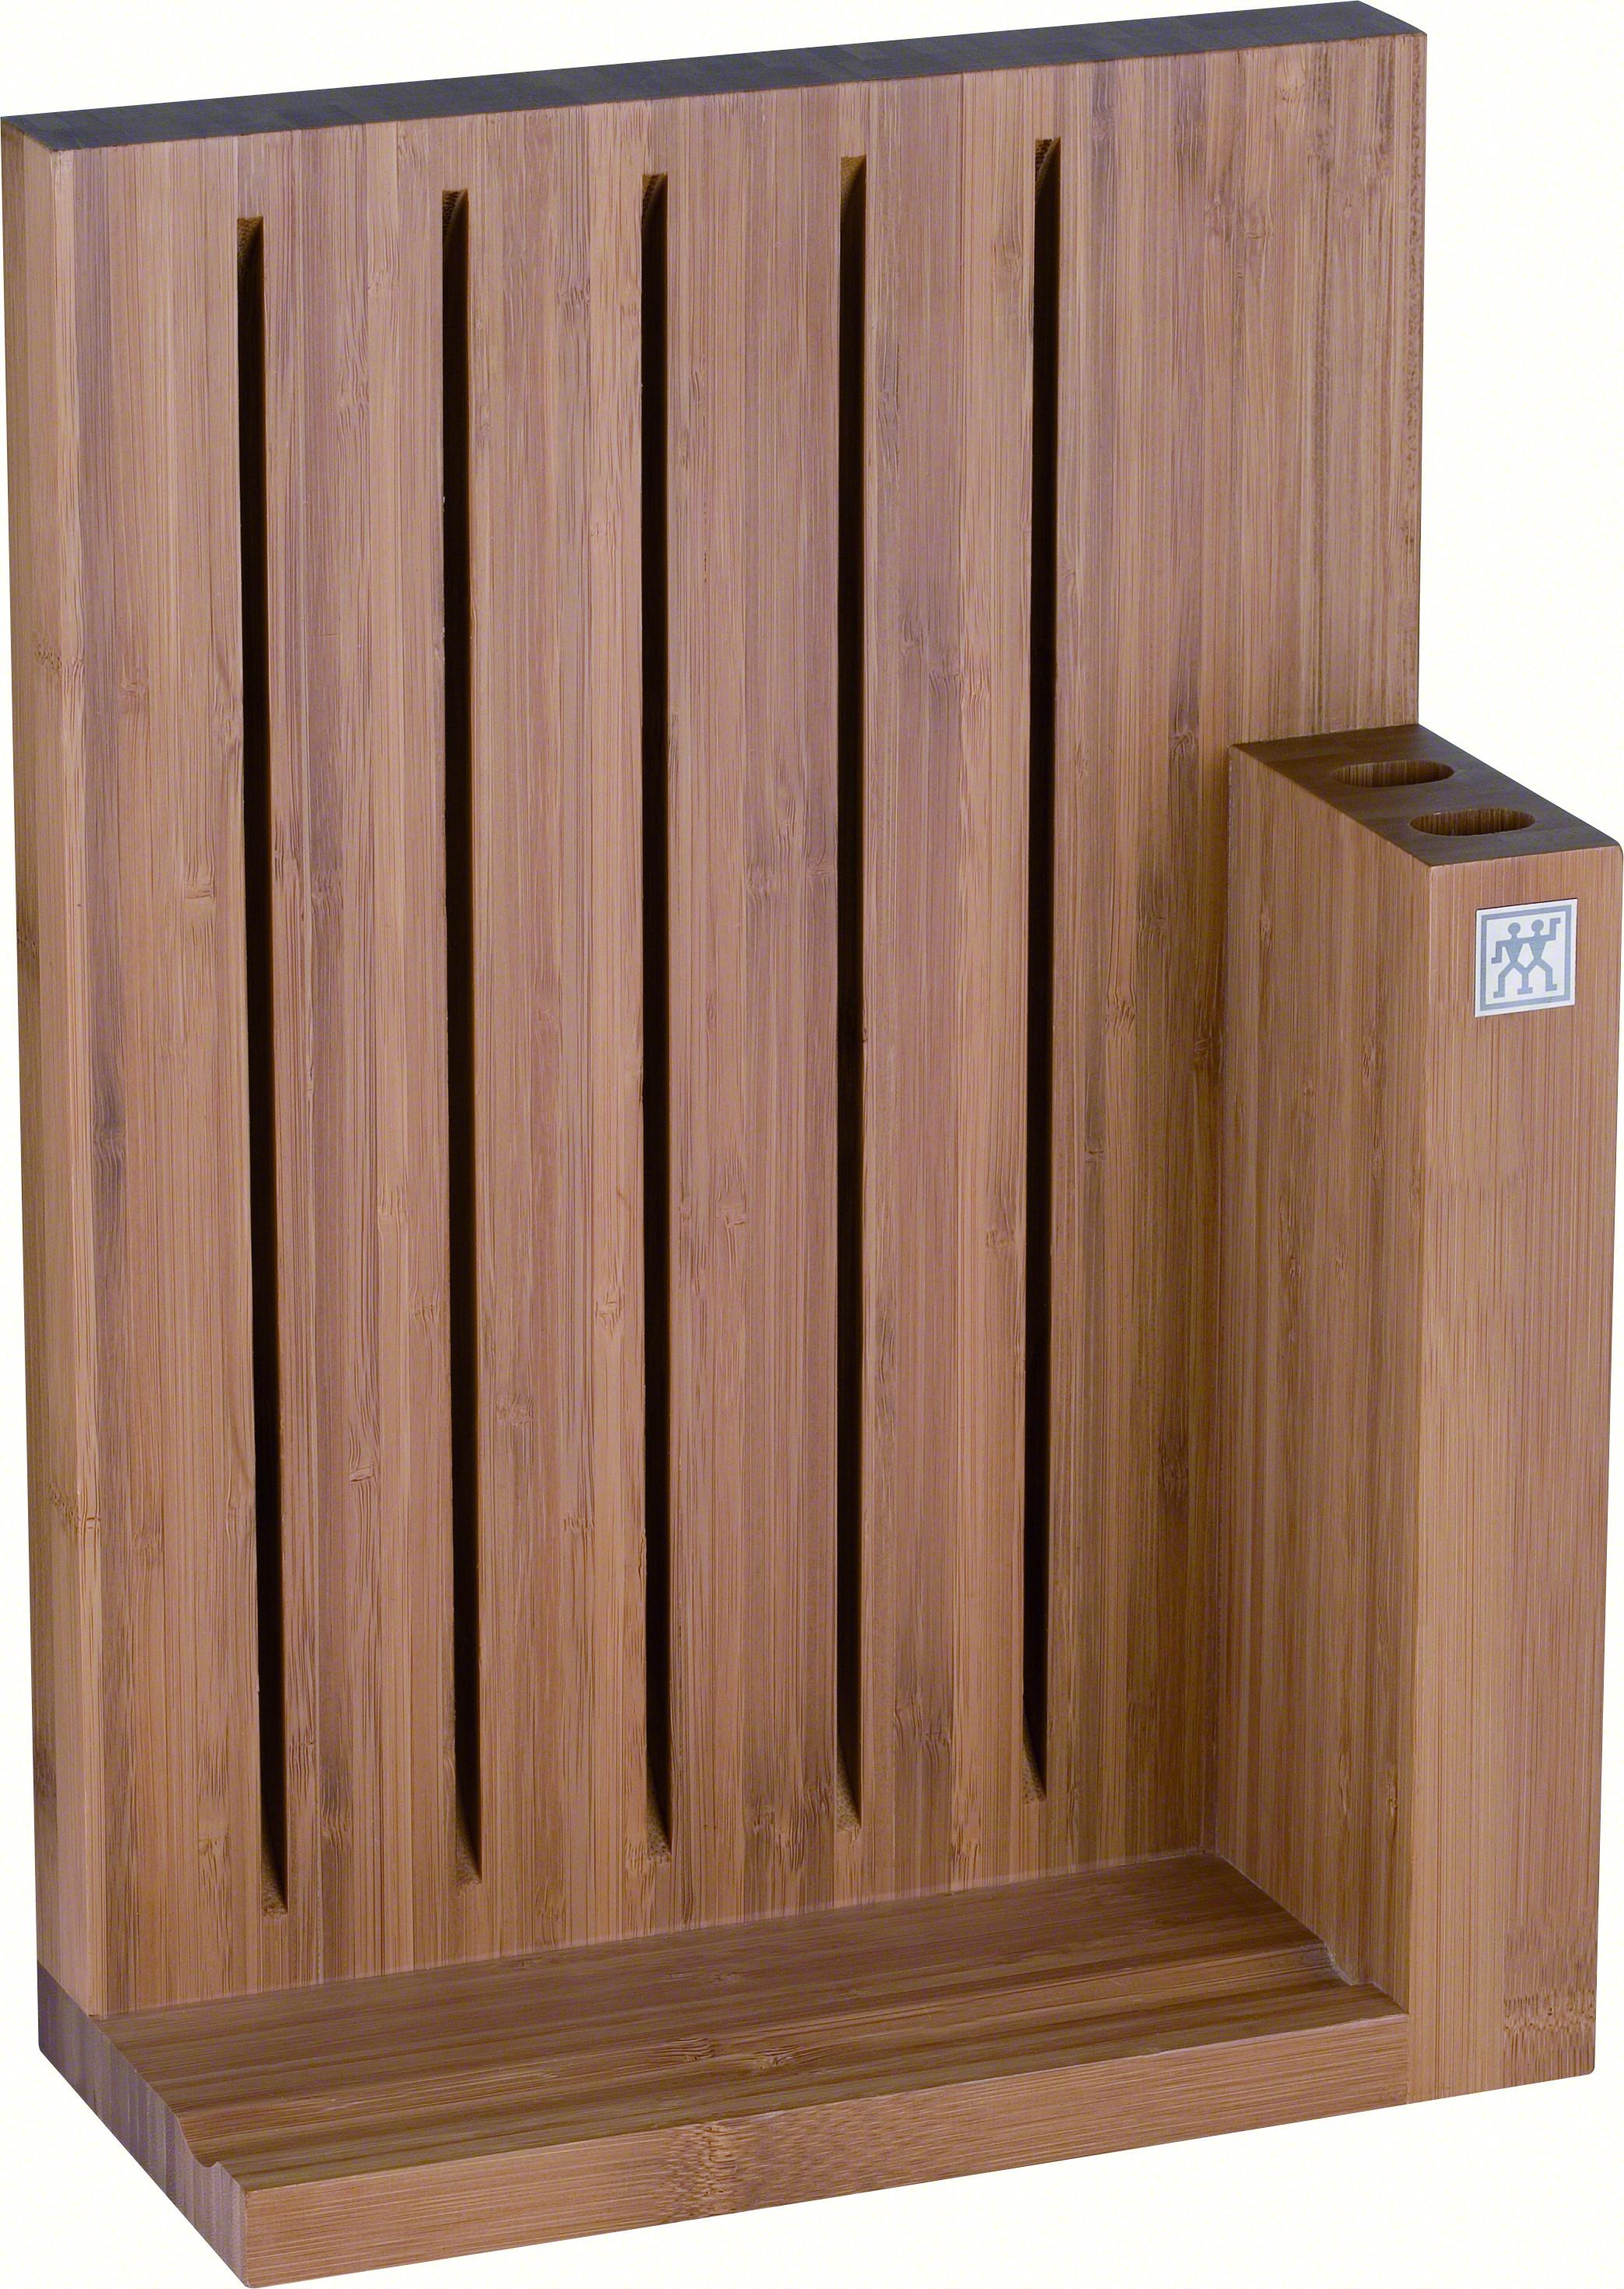 Magnetický blok na nože bambus na 7ks - ZWILLING J.A. HENCKELS Solingen